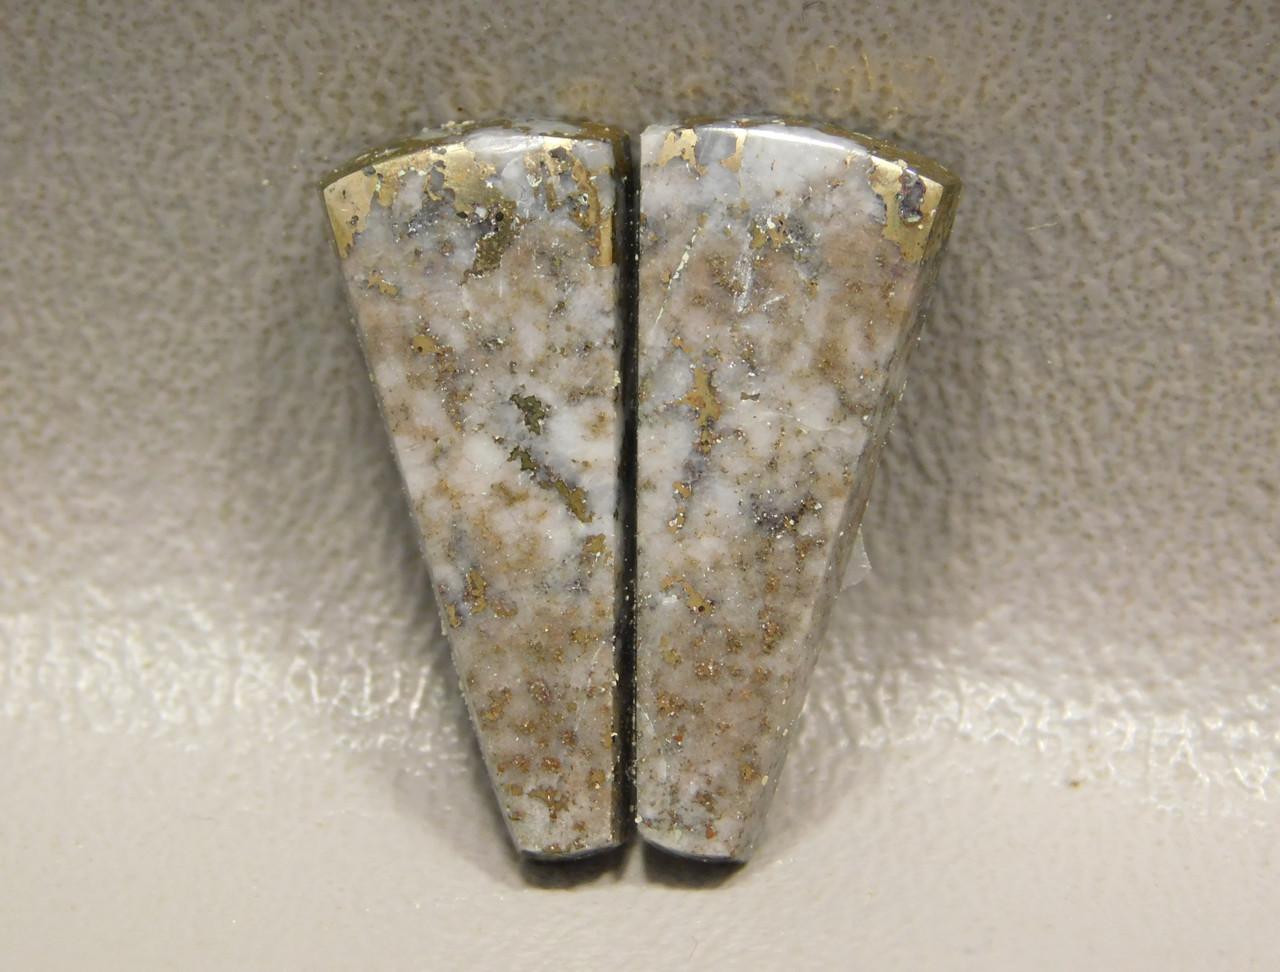 Mohawkite Matched Pair Cabochon Trapezoid Metallic Gemstone #10